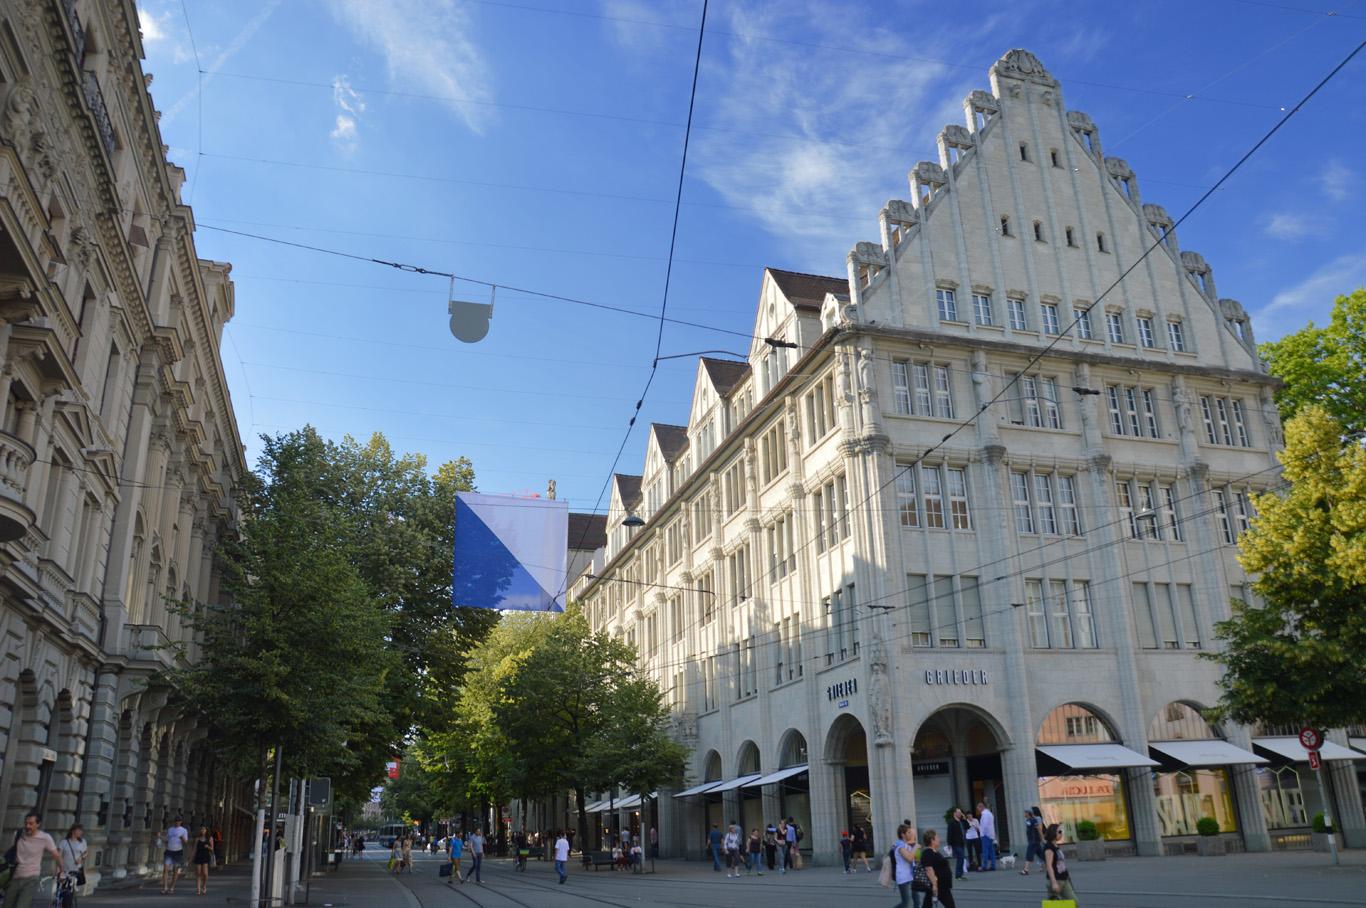 Bahnhofstrasse street